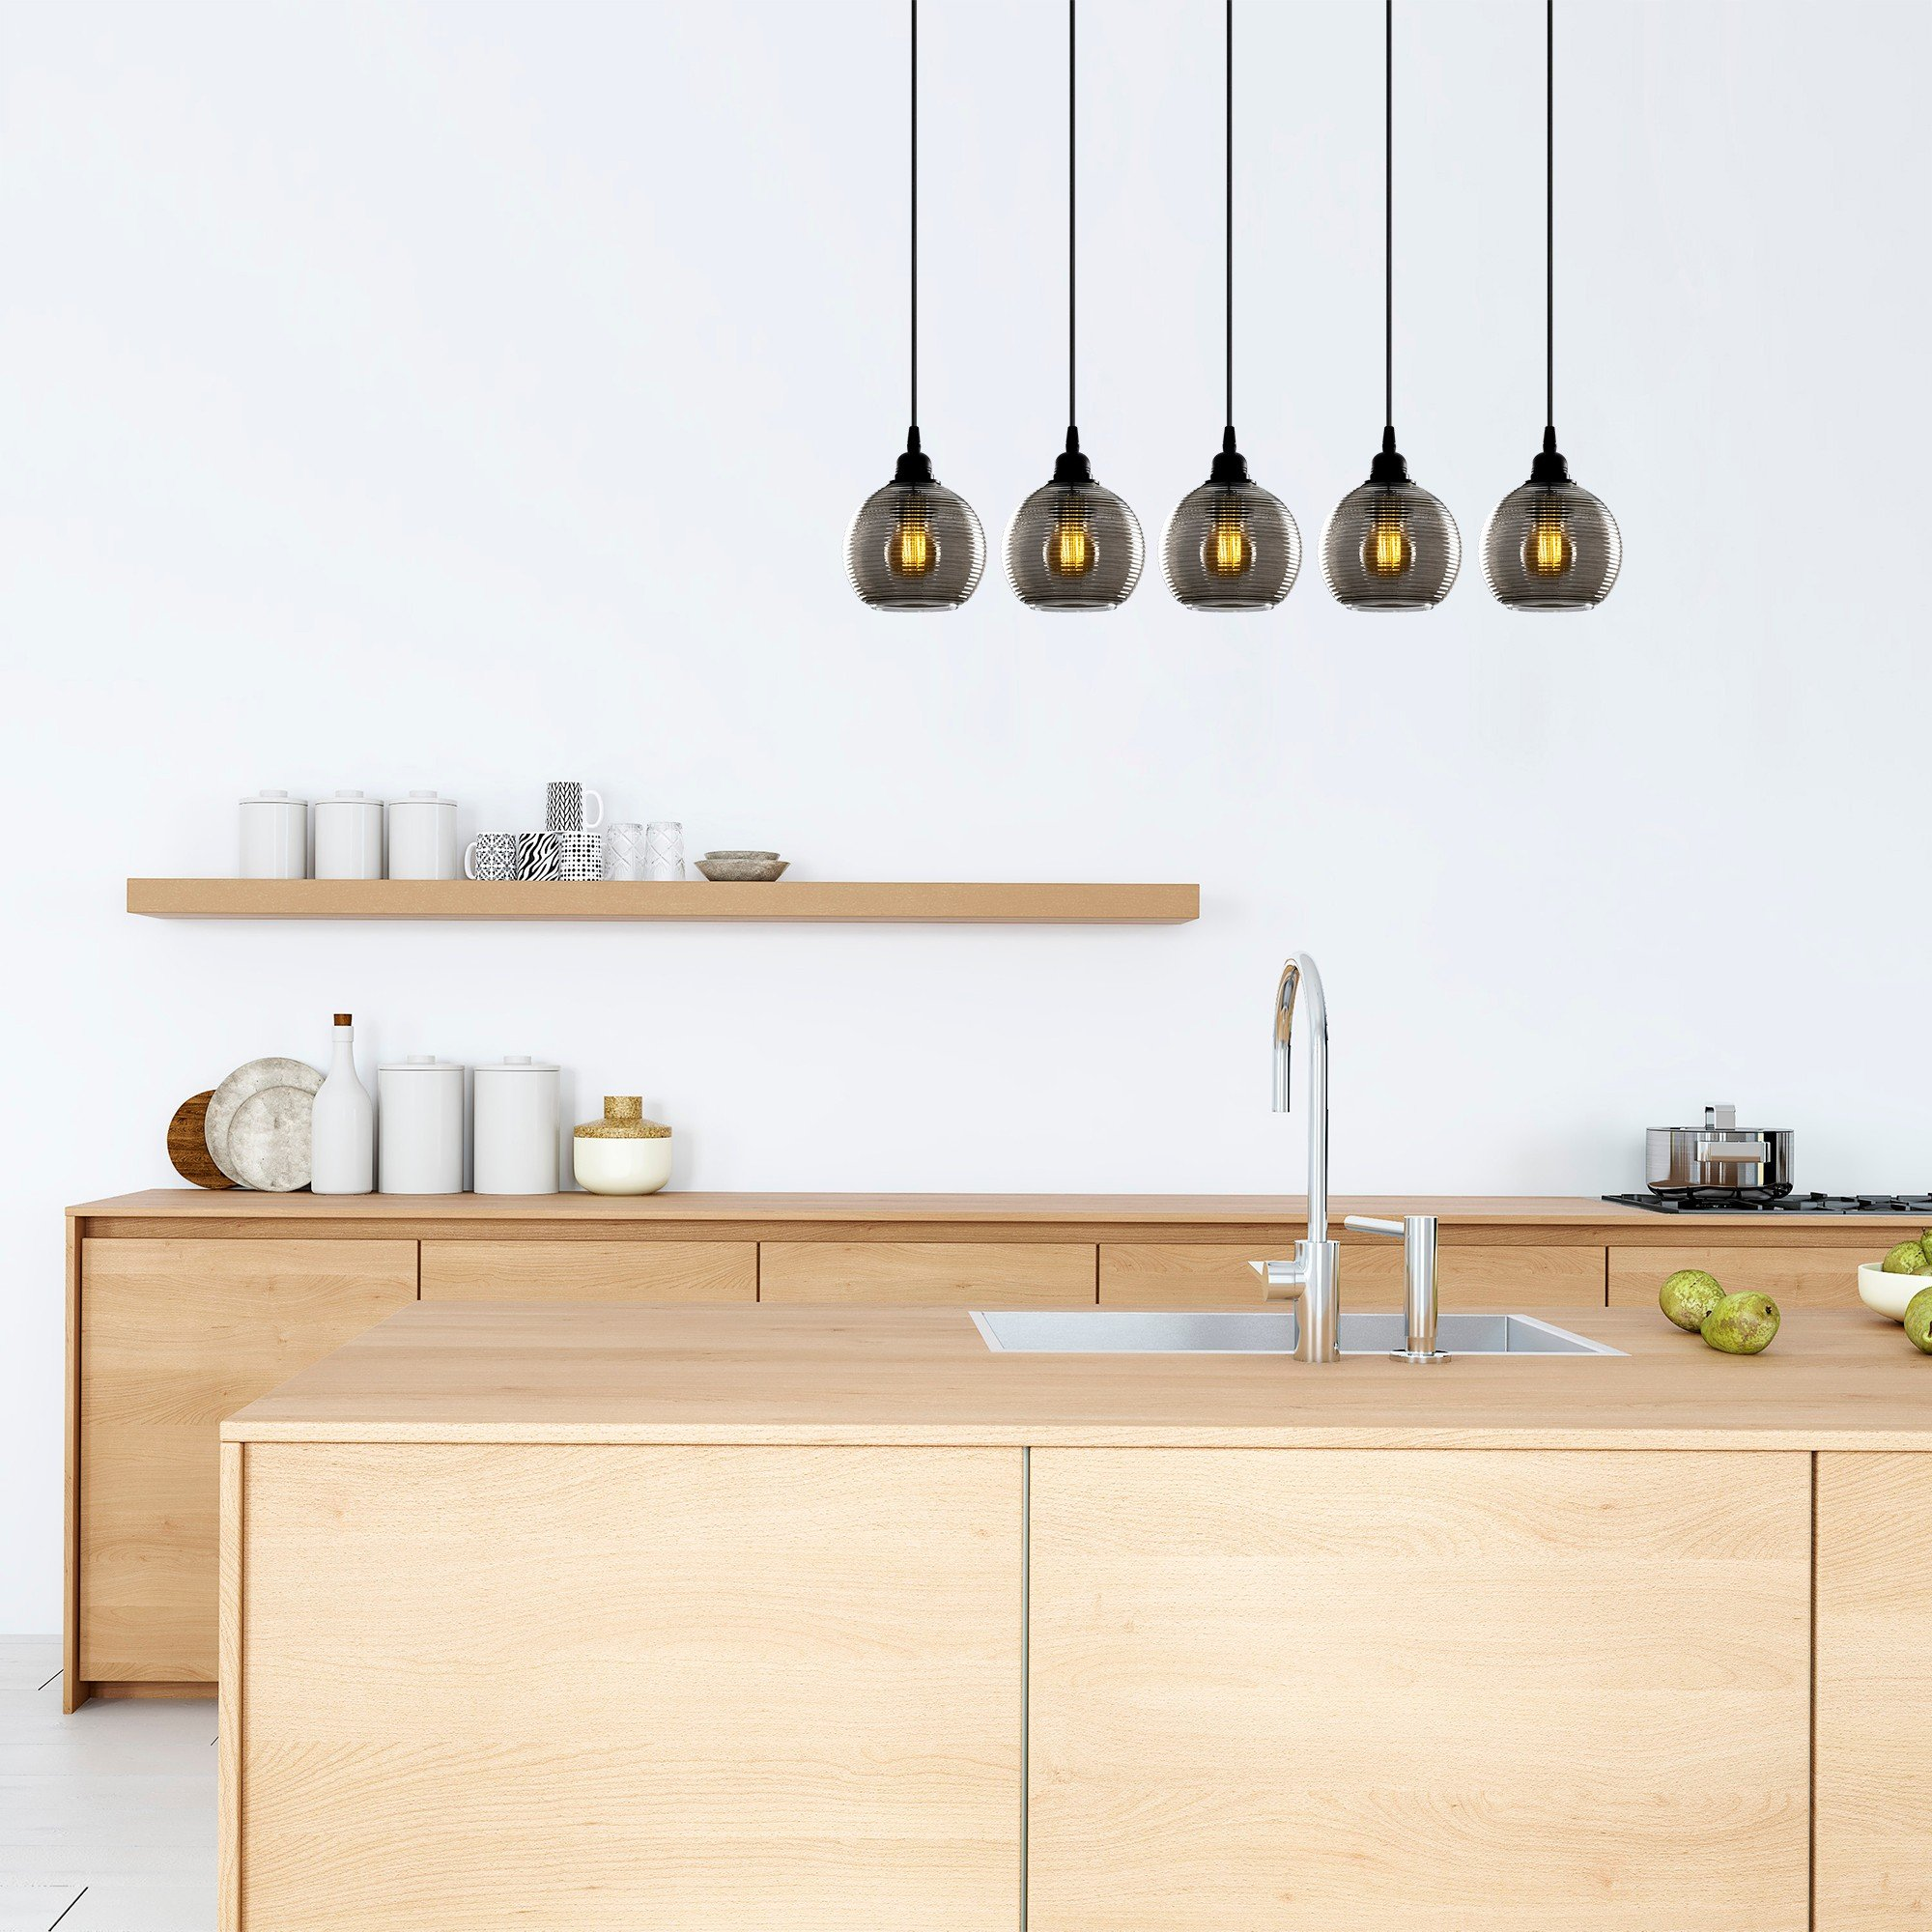 Hanglamp smoked glass lampen zwart 5 keer E27 fitting - inrichting